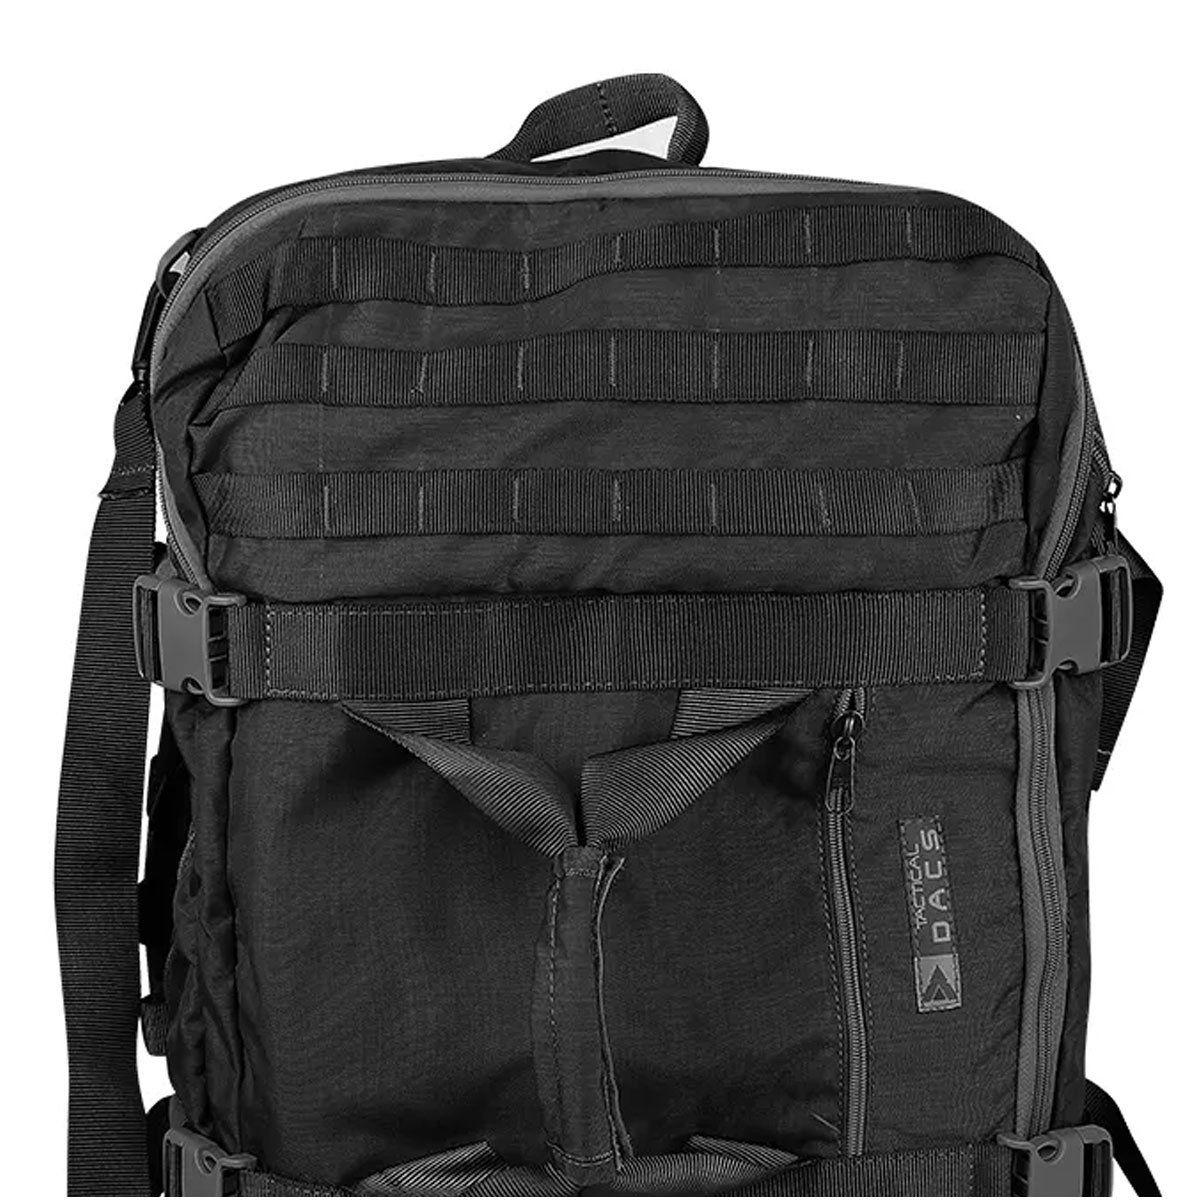 Mochila Instruction Bag Dacs em Nylon